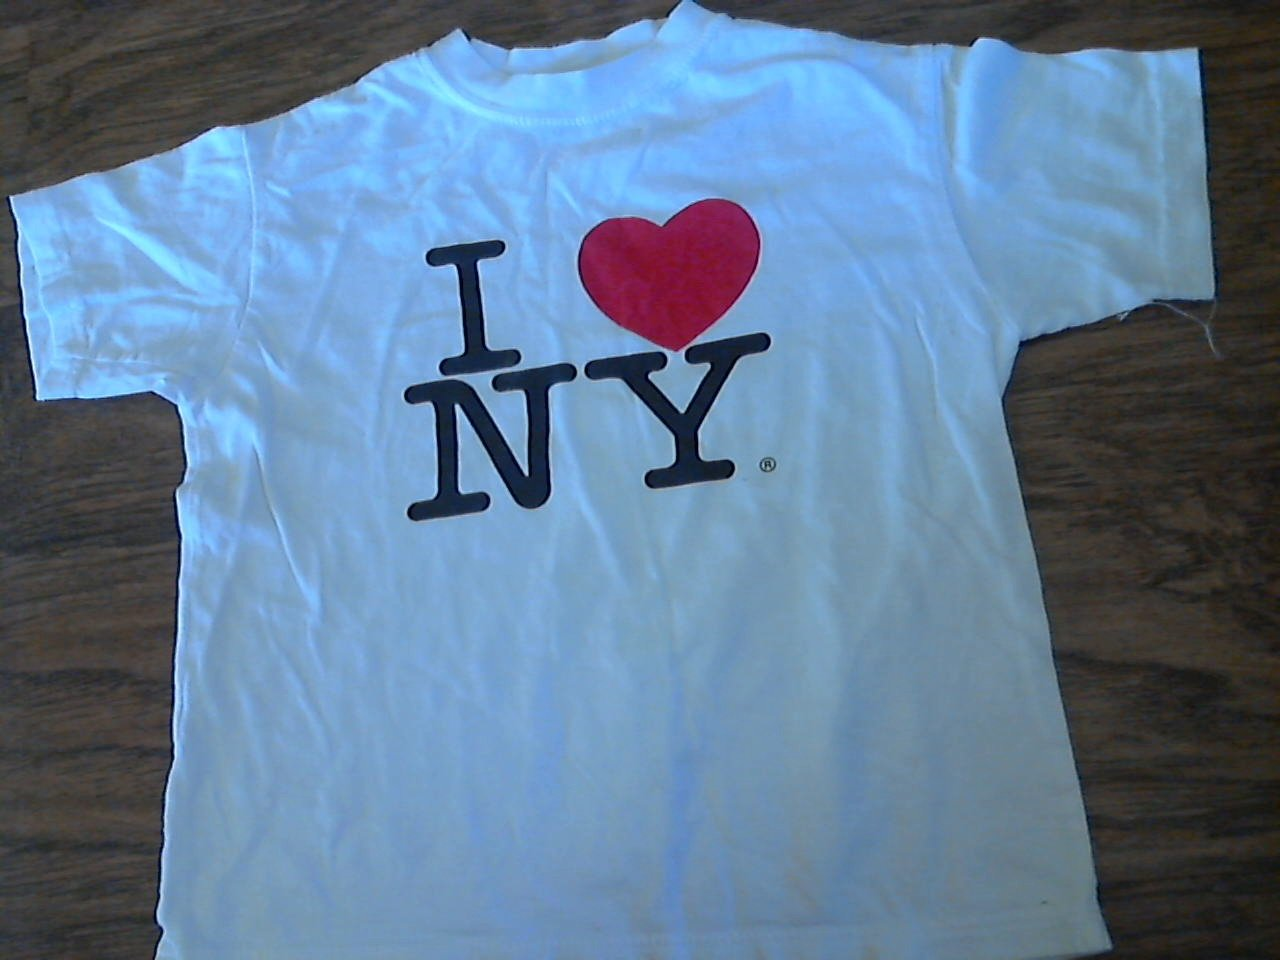 Talha USA girl's white short sleeve shirt Size Medium